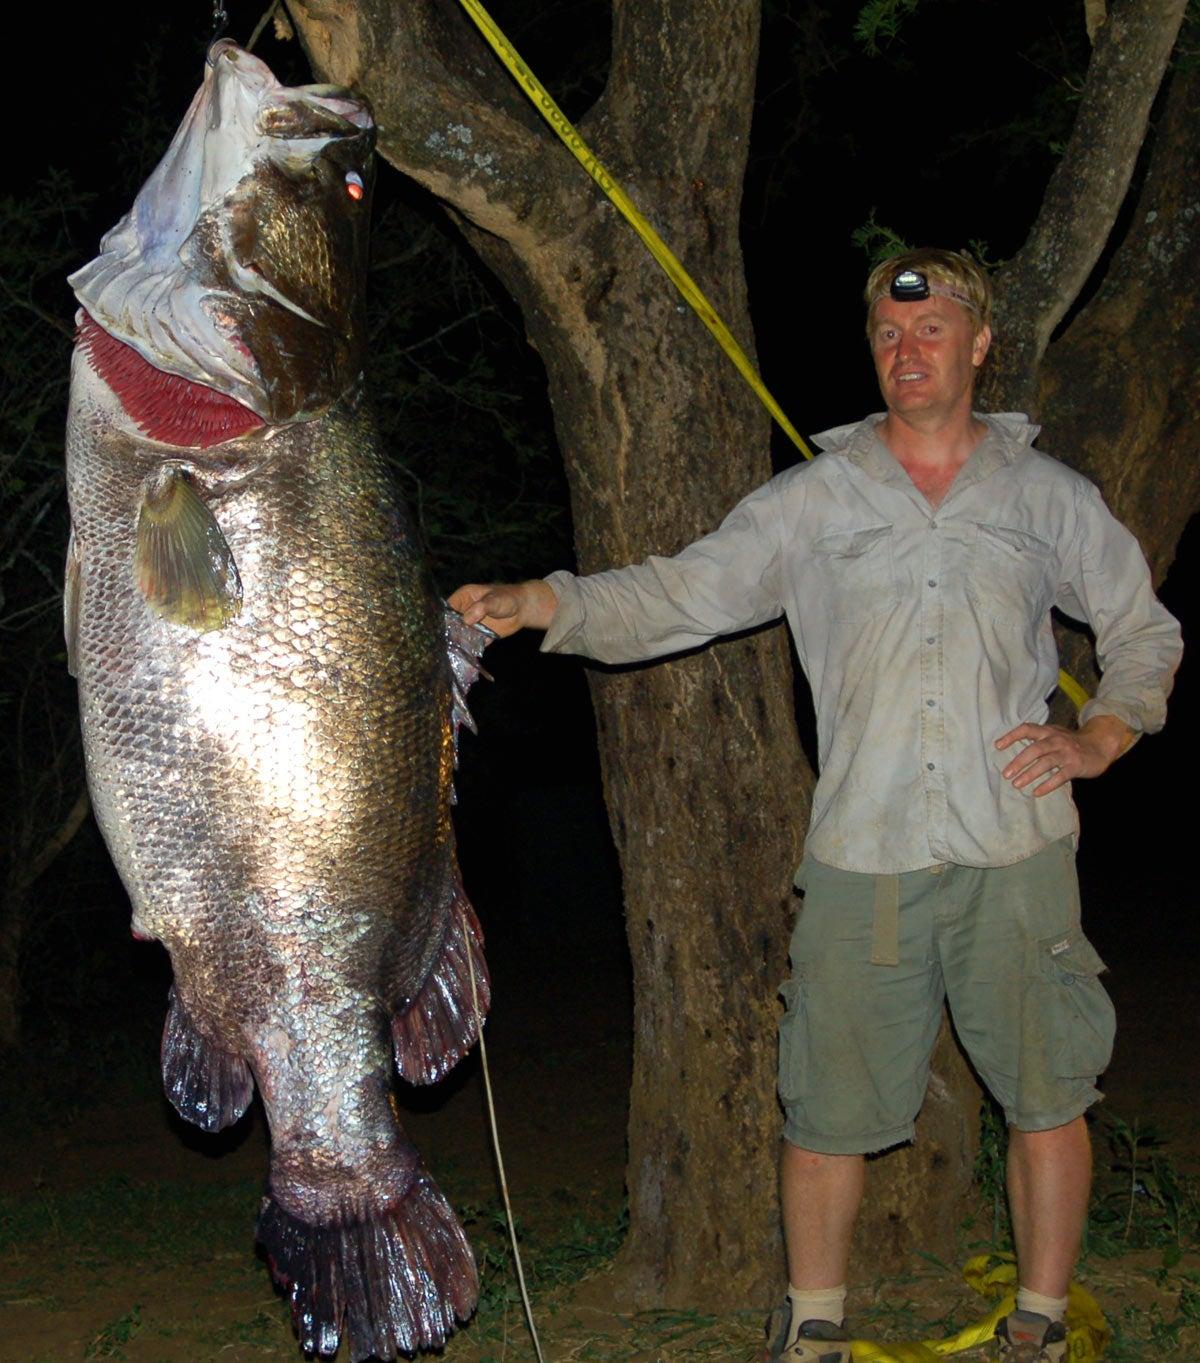 Man vs. Crocodile vs. Giant Nile Perch: An African Fishing Adventure